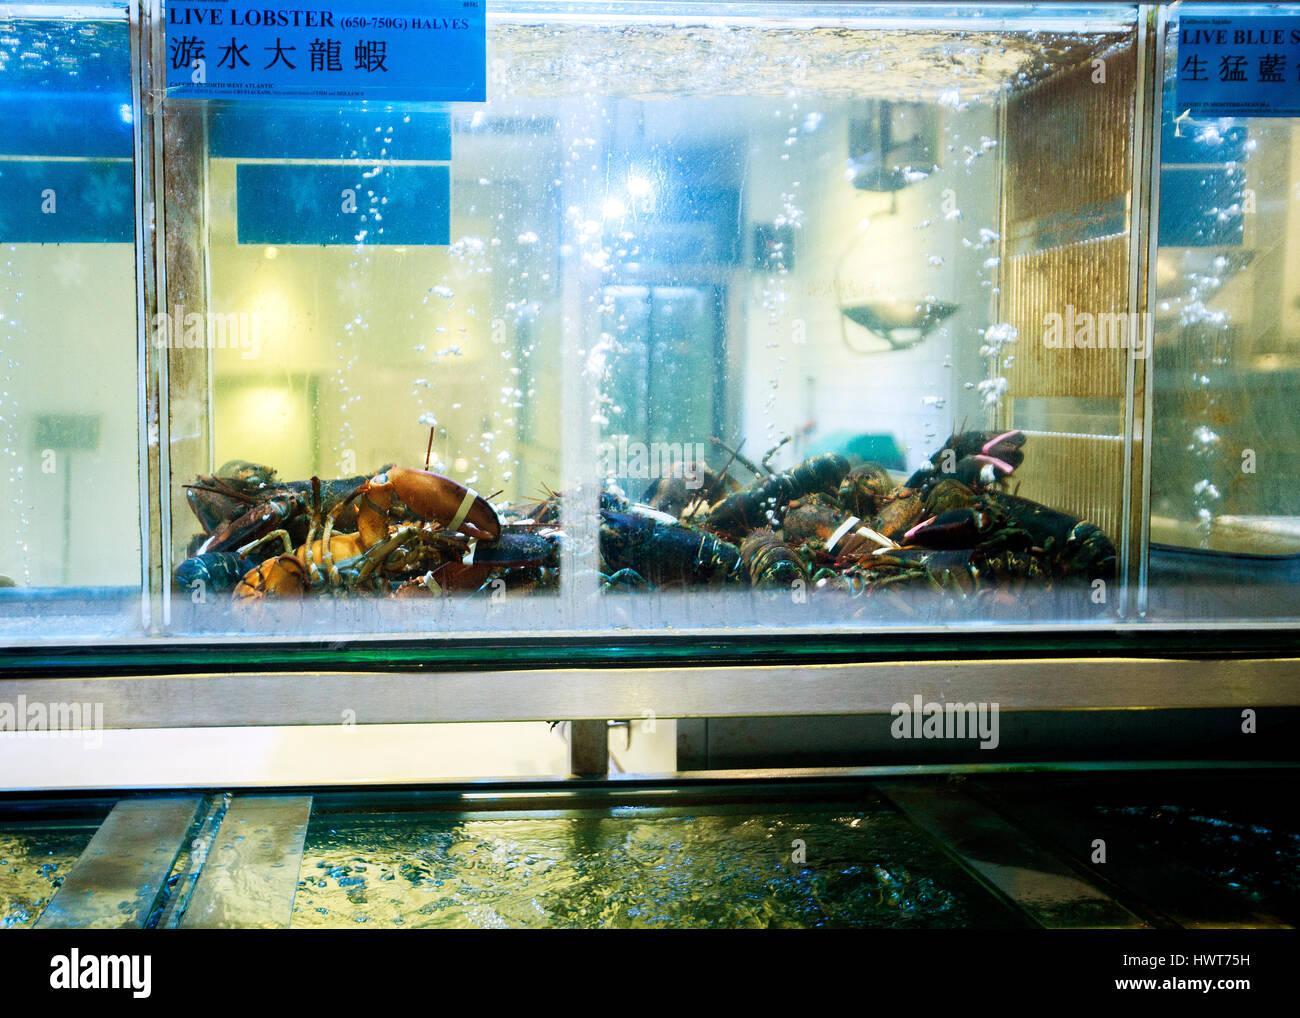 Aquarium fish tank china - Stock Photo Lobsters Alive In Restaurant Fish Tank China Town London